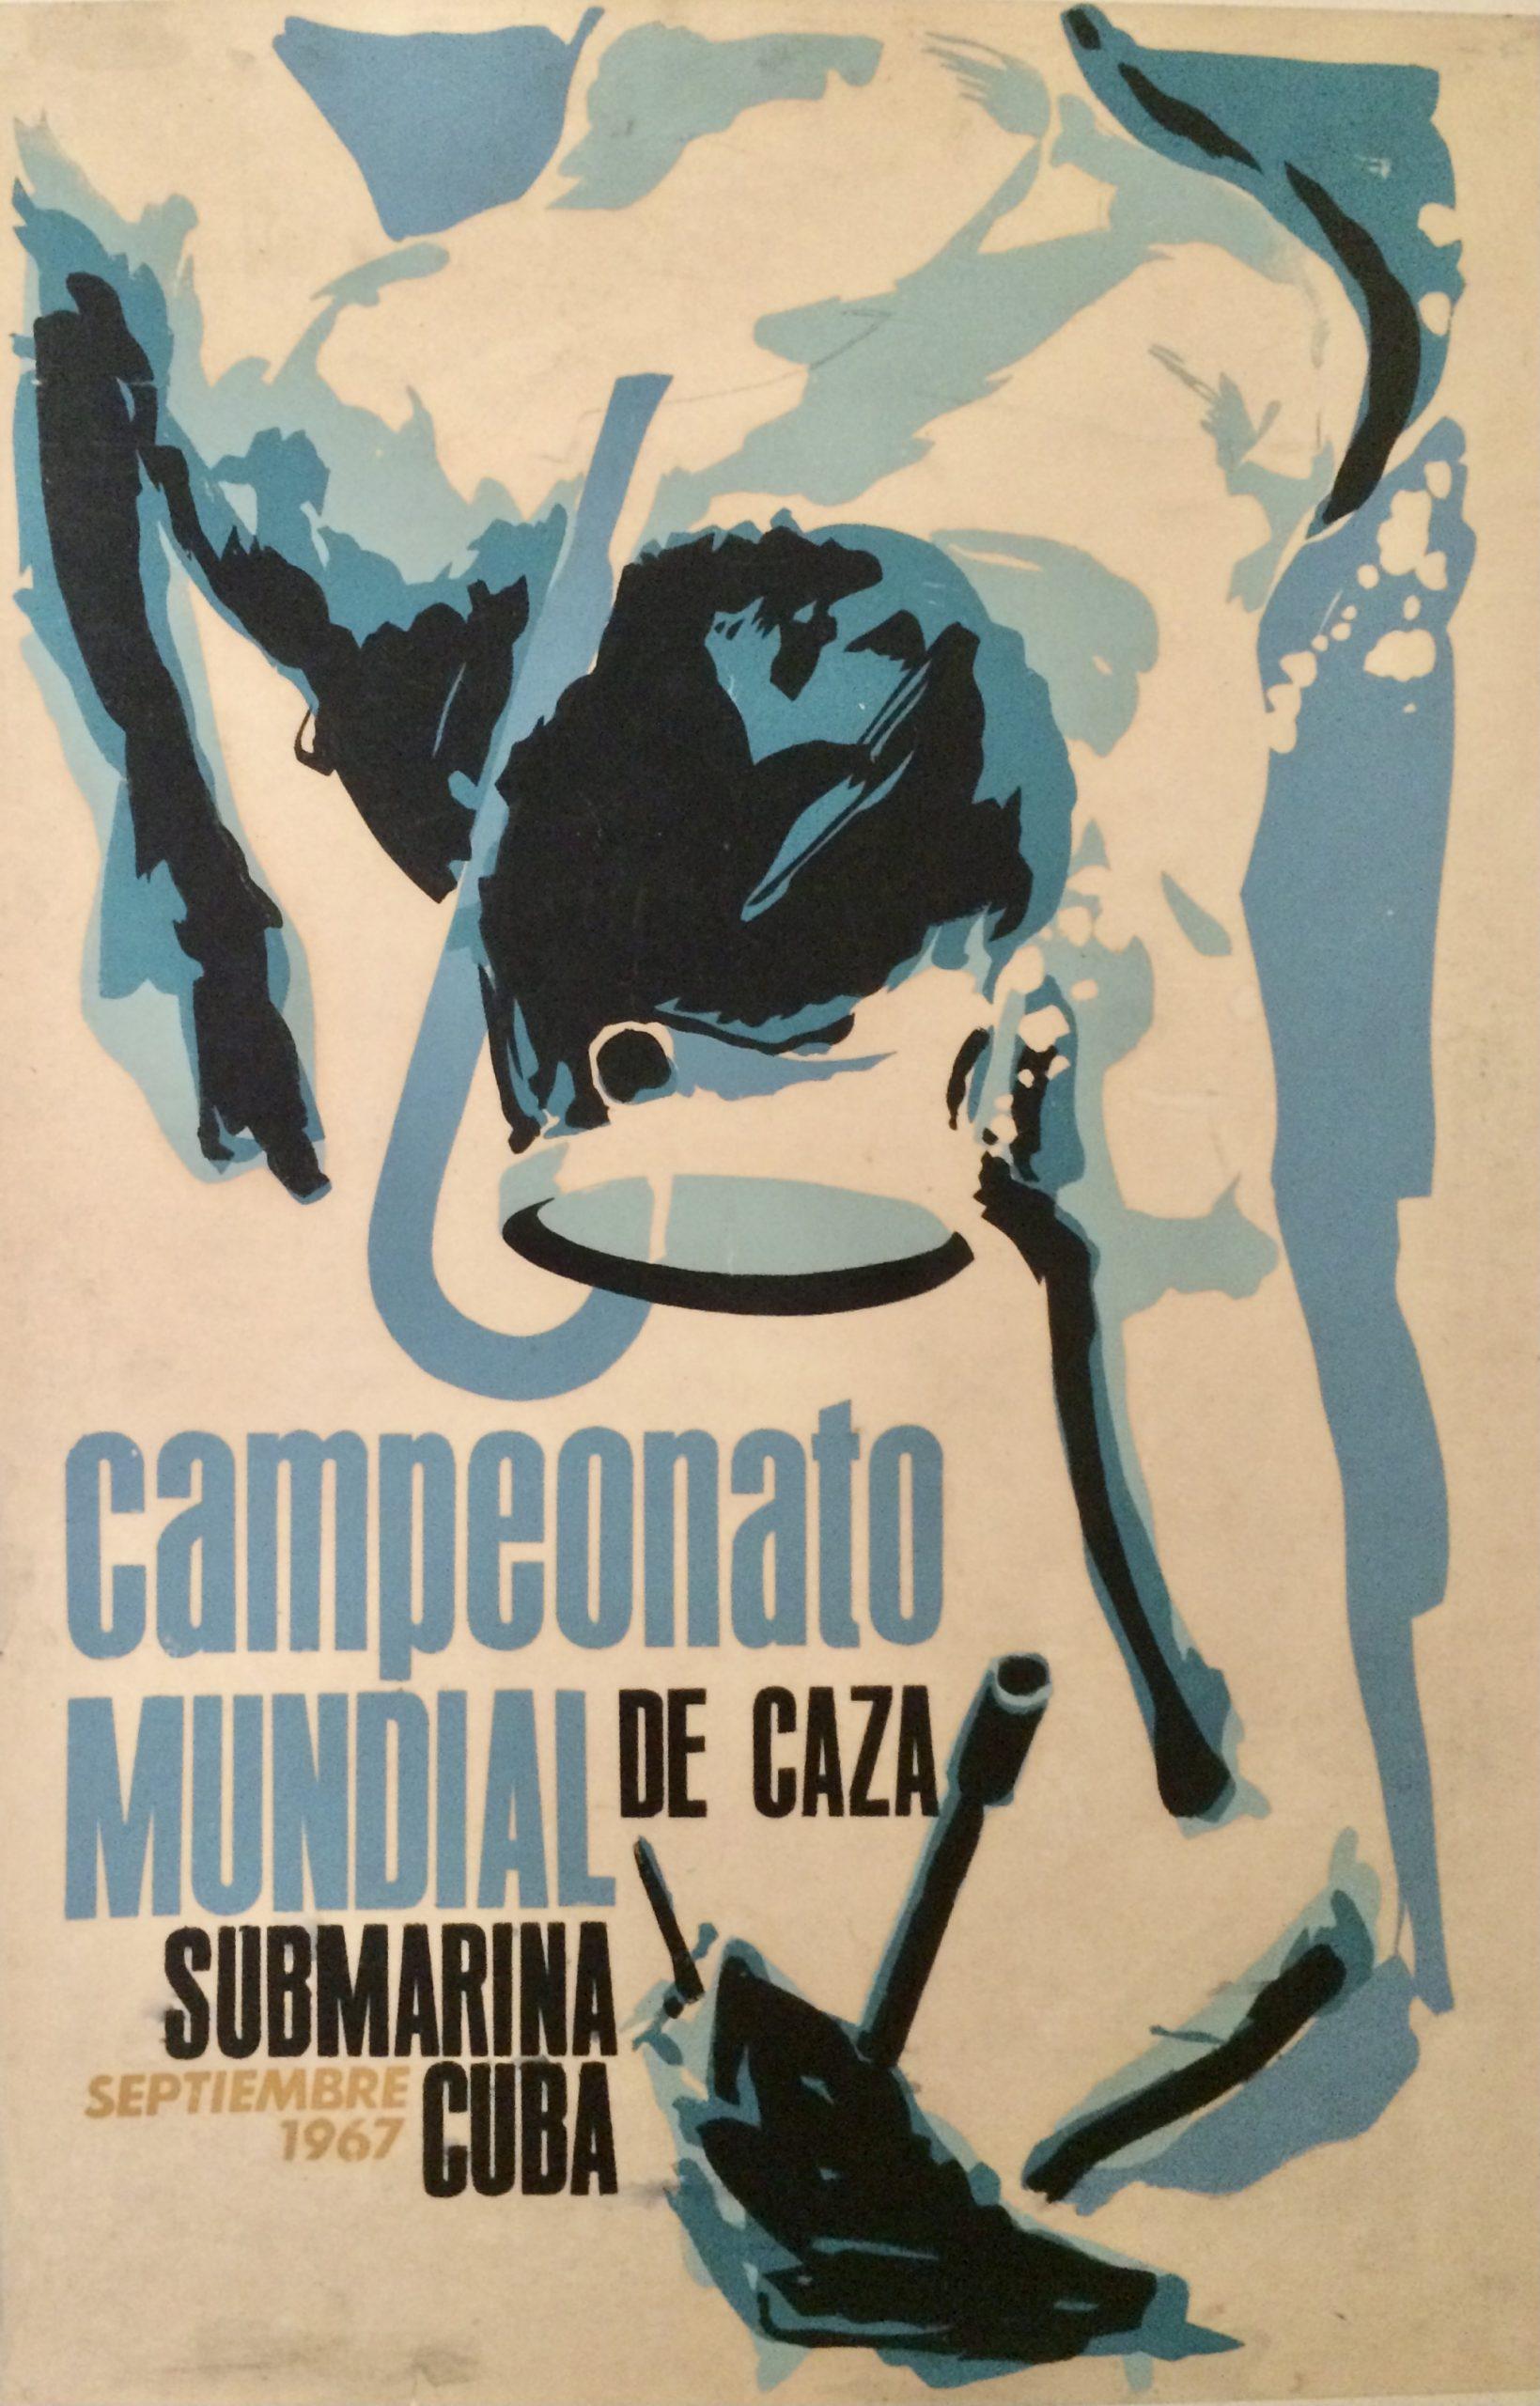 diving competition cuba 1967